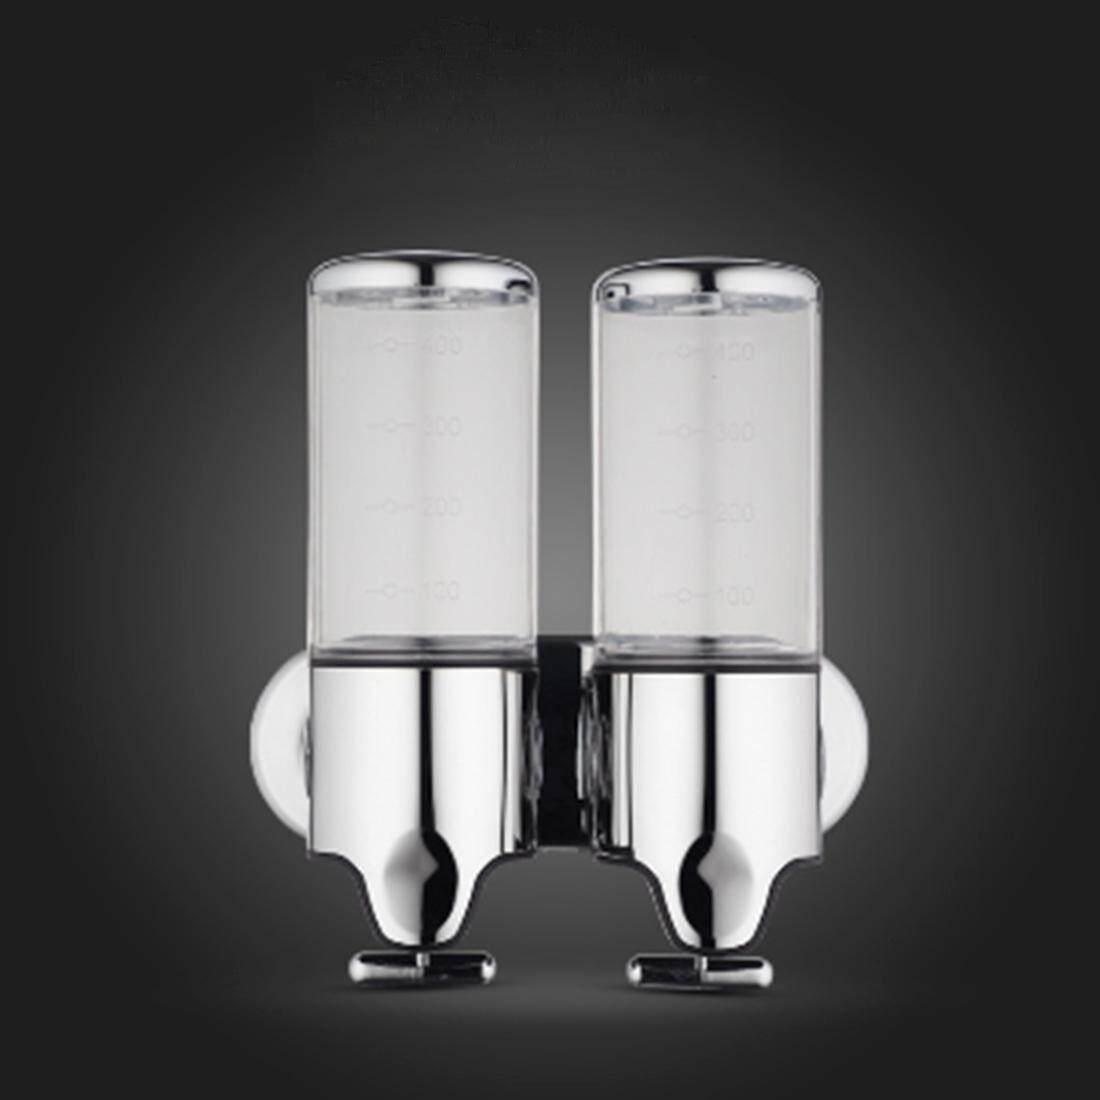 Hotel Pancuran Manual Dispenser Rumah Tangga Anti Karat Cuci Cair Sampo Botol Sabun, Kapasitas: 1000 Ml (Transparan) -Internasional